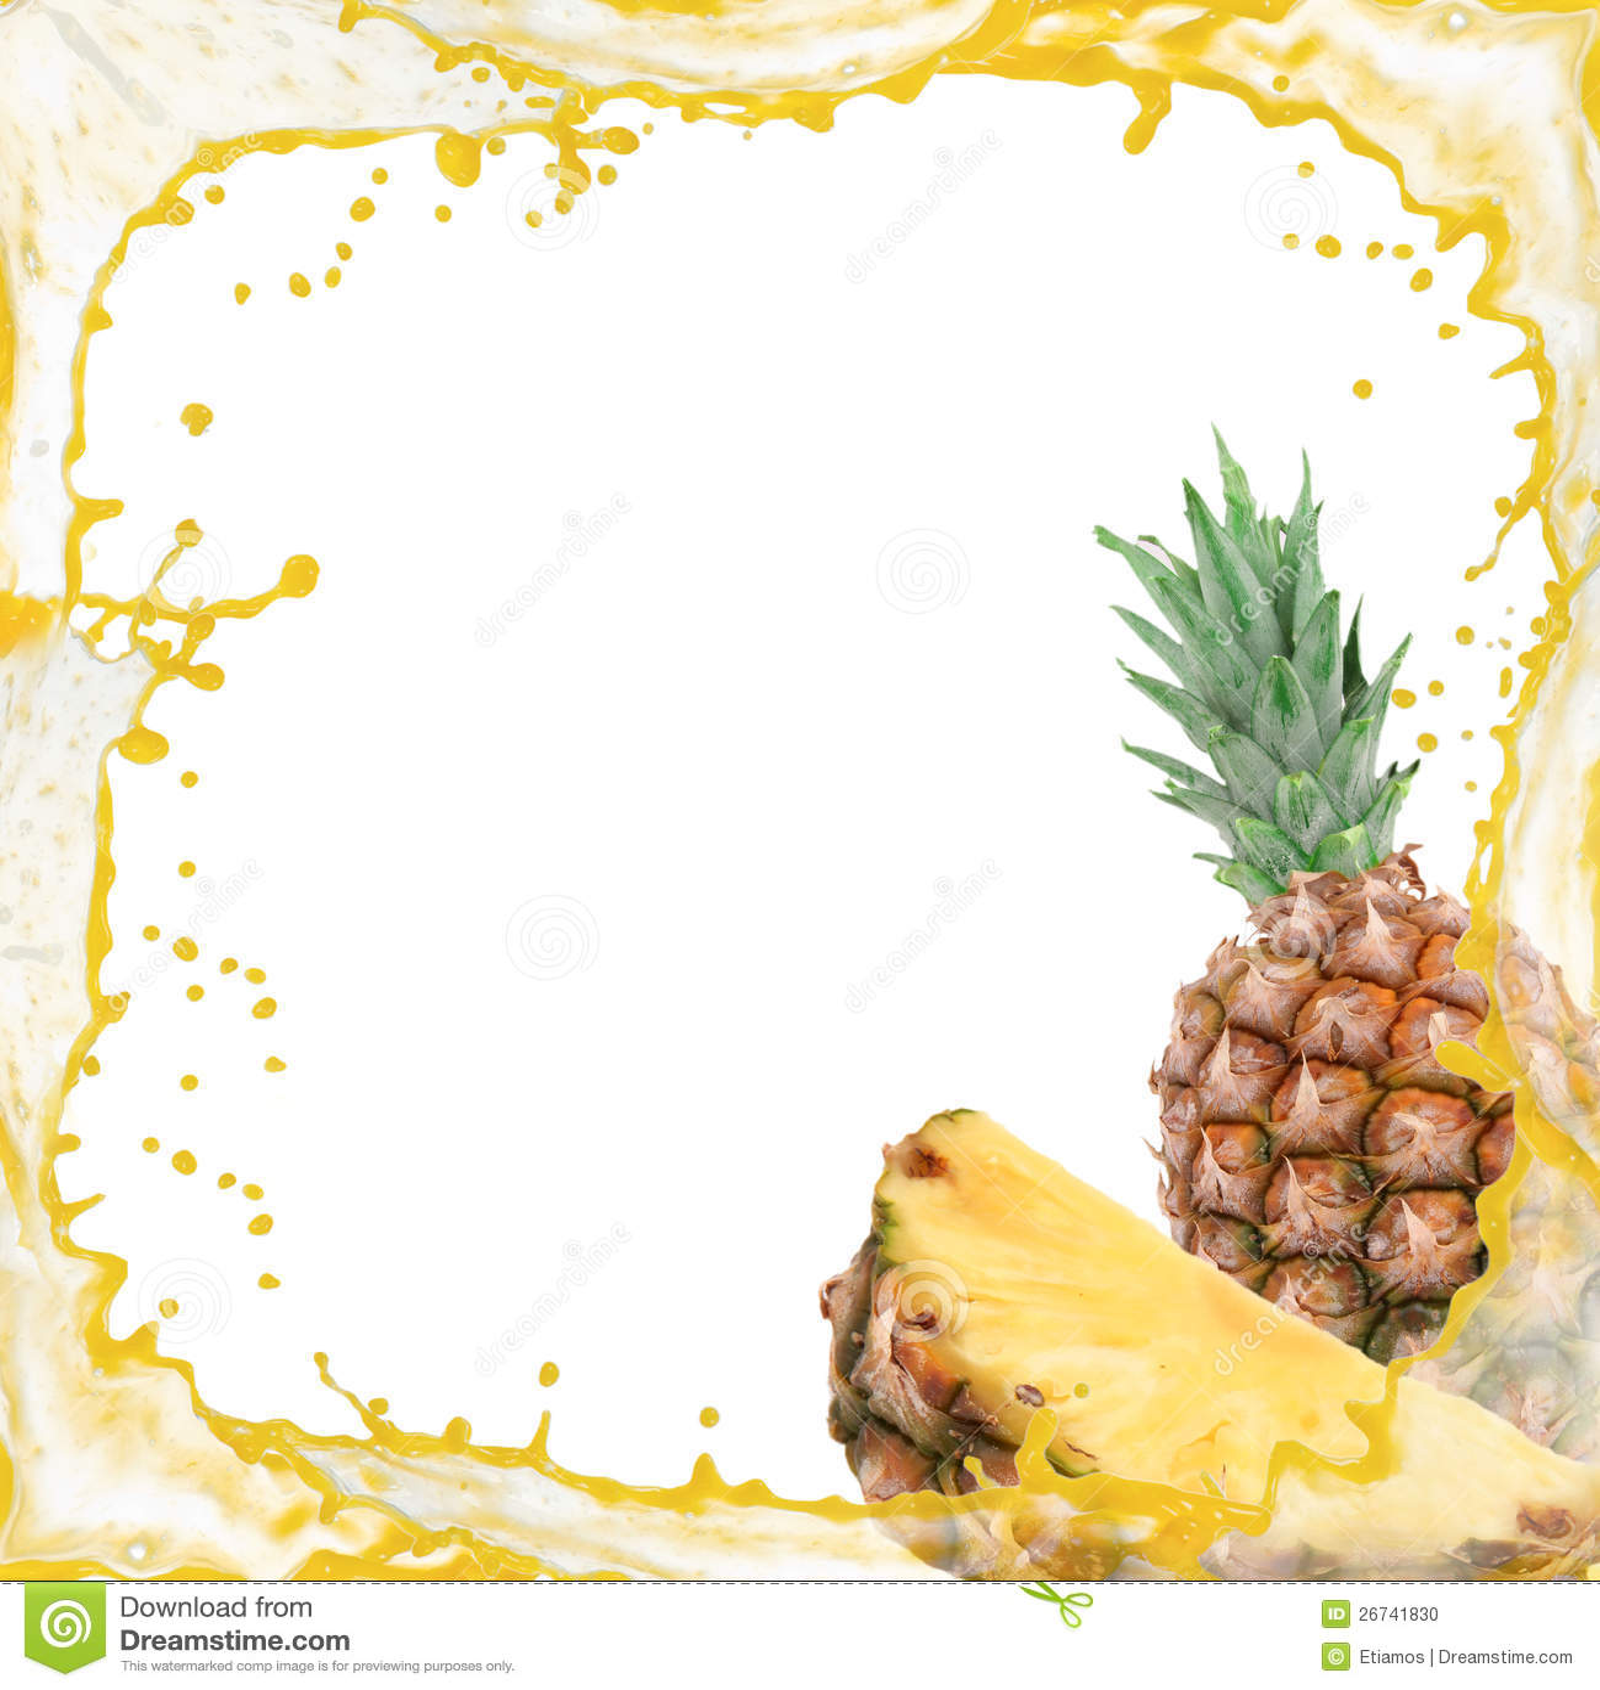 Pineapple Splash Stock Photo Image Of Antioxidant Motion